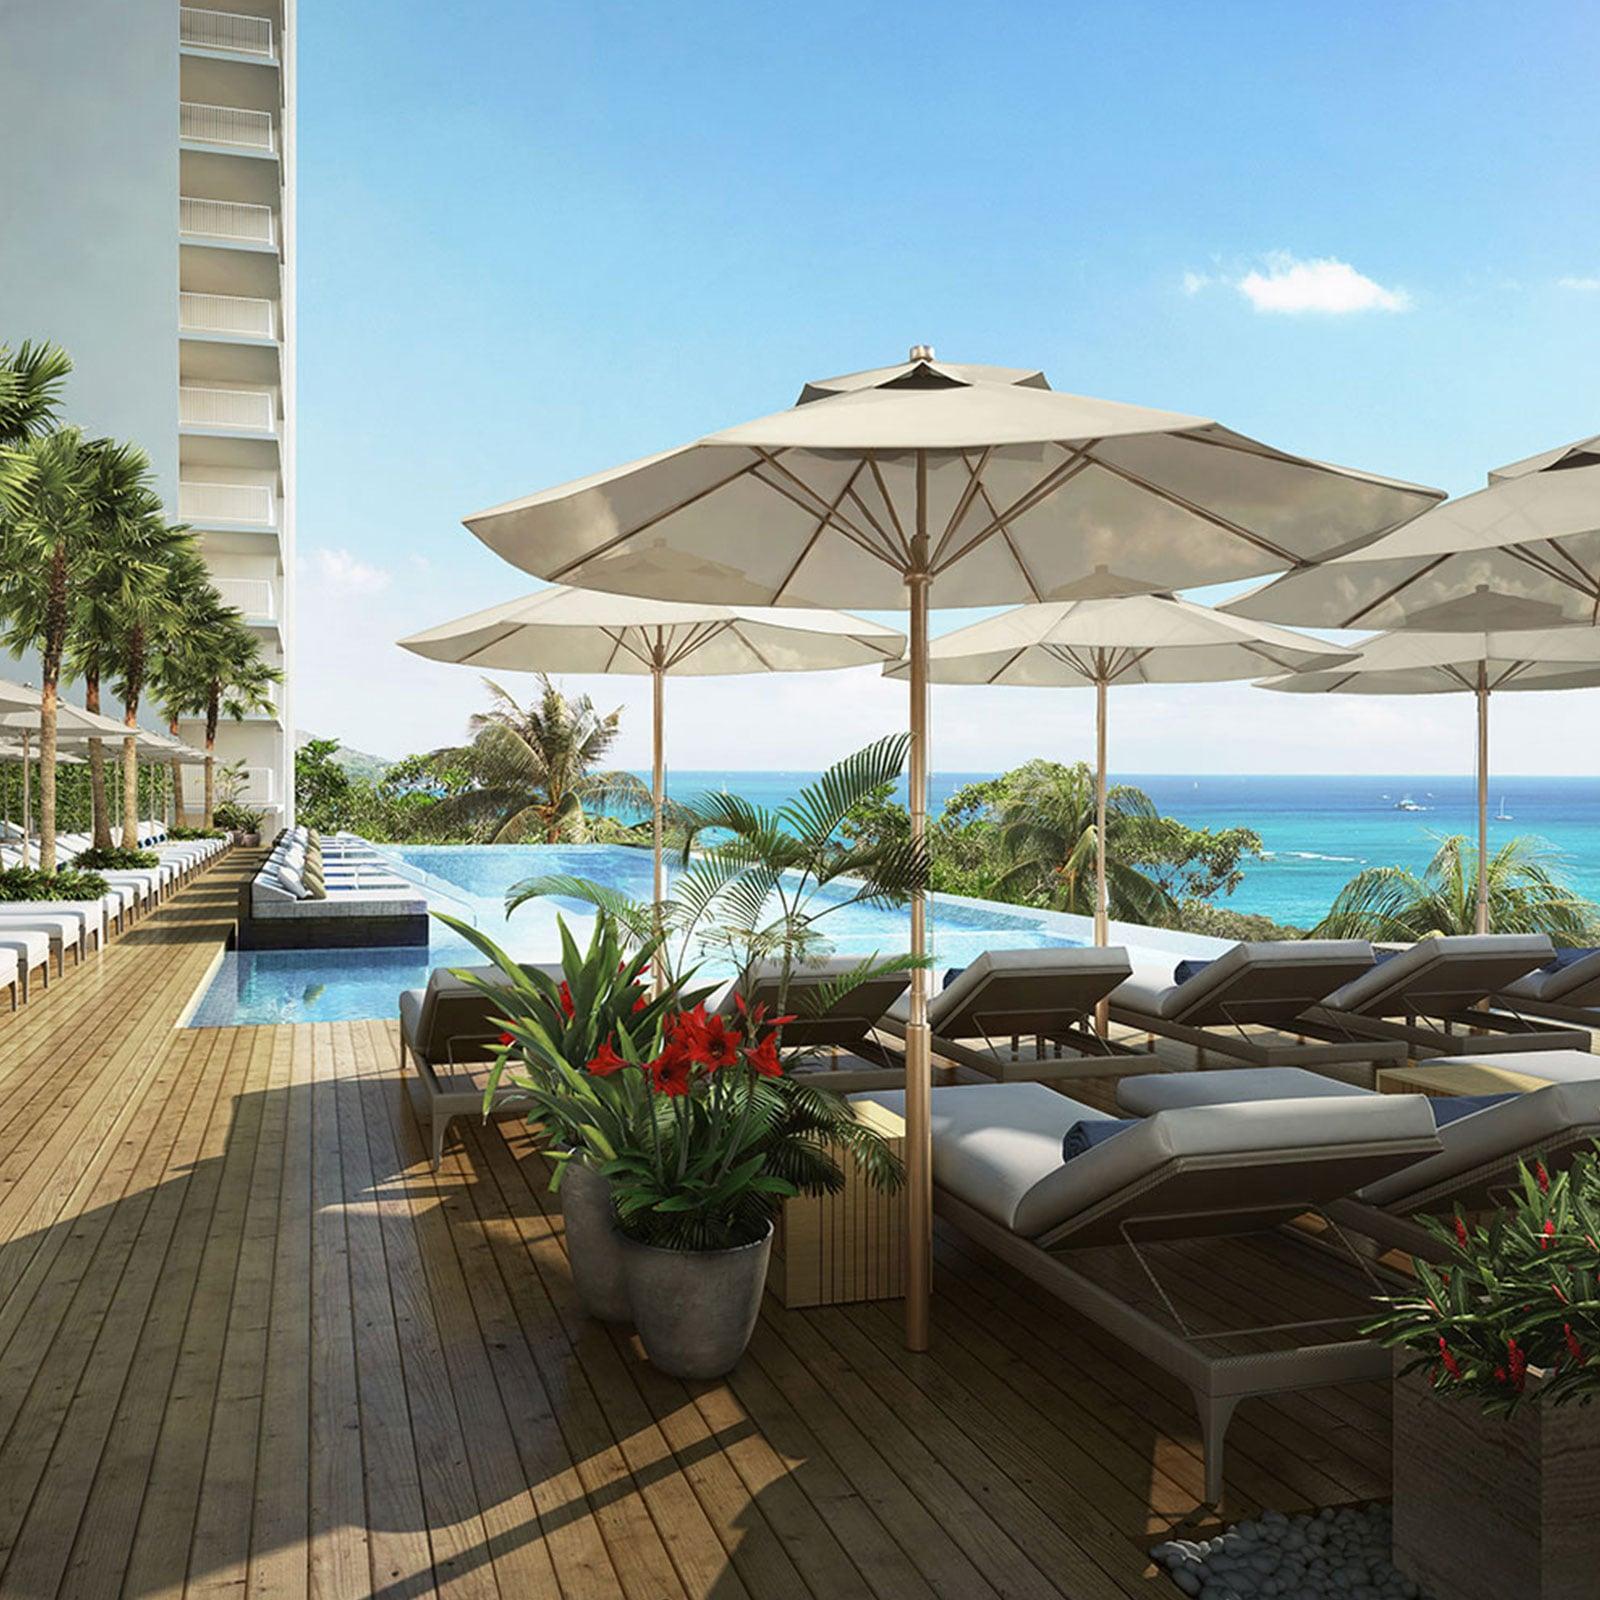 Pacific Beach Hotel Transforms Into